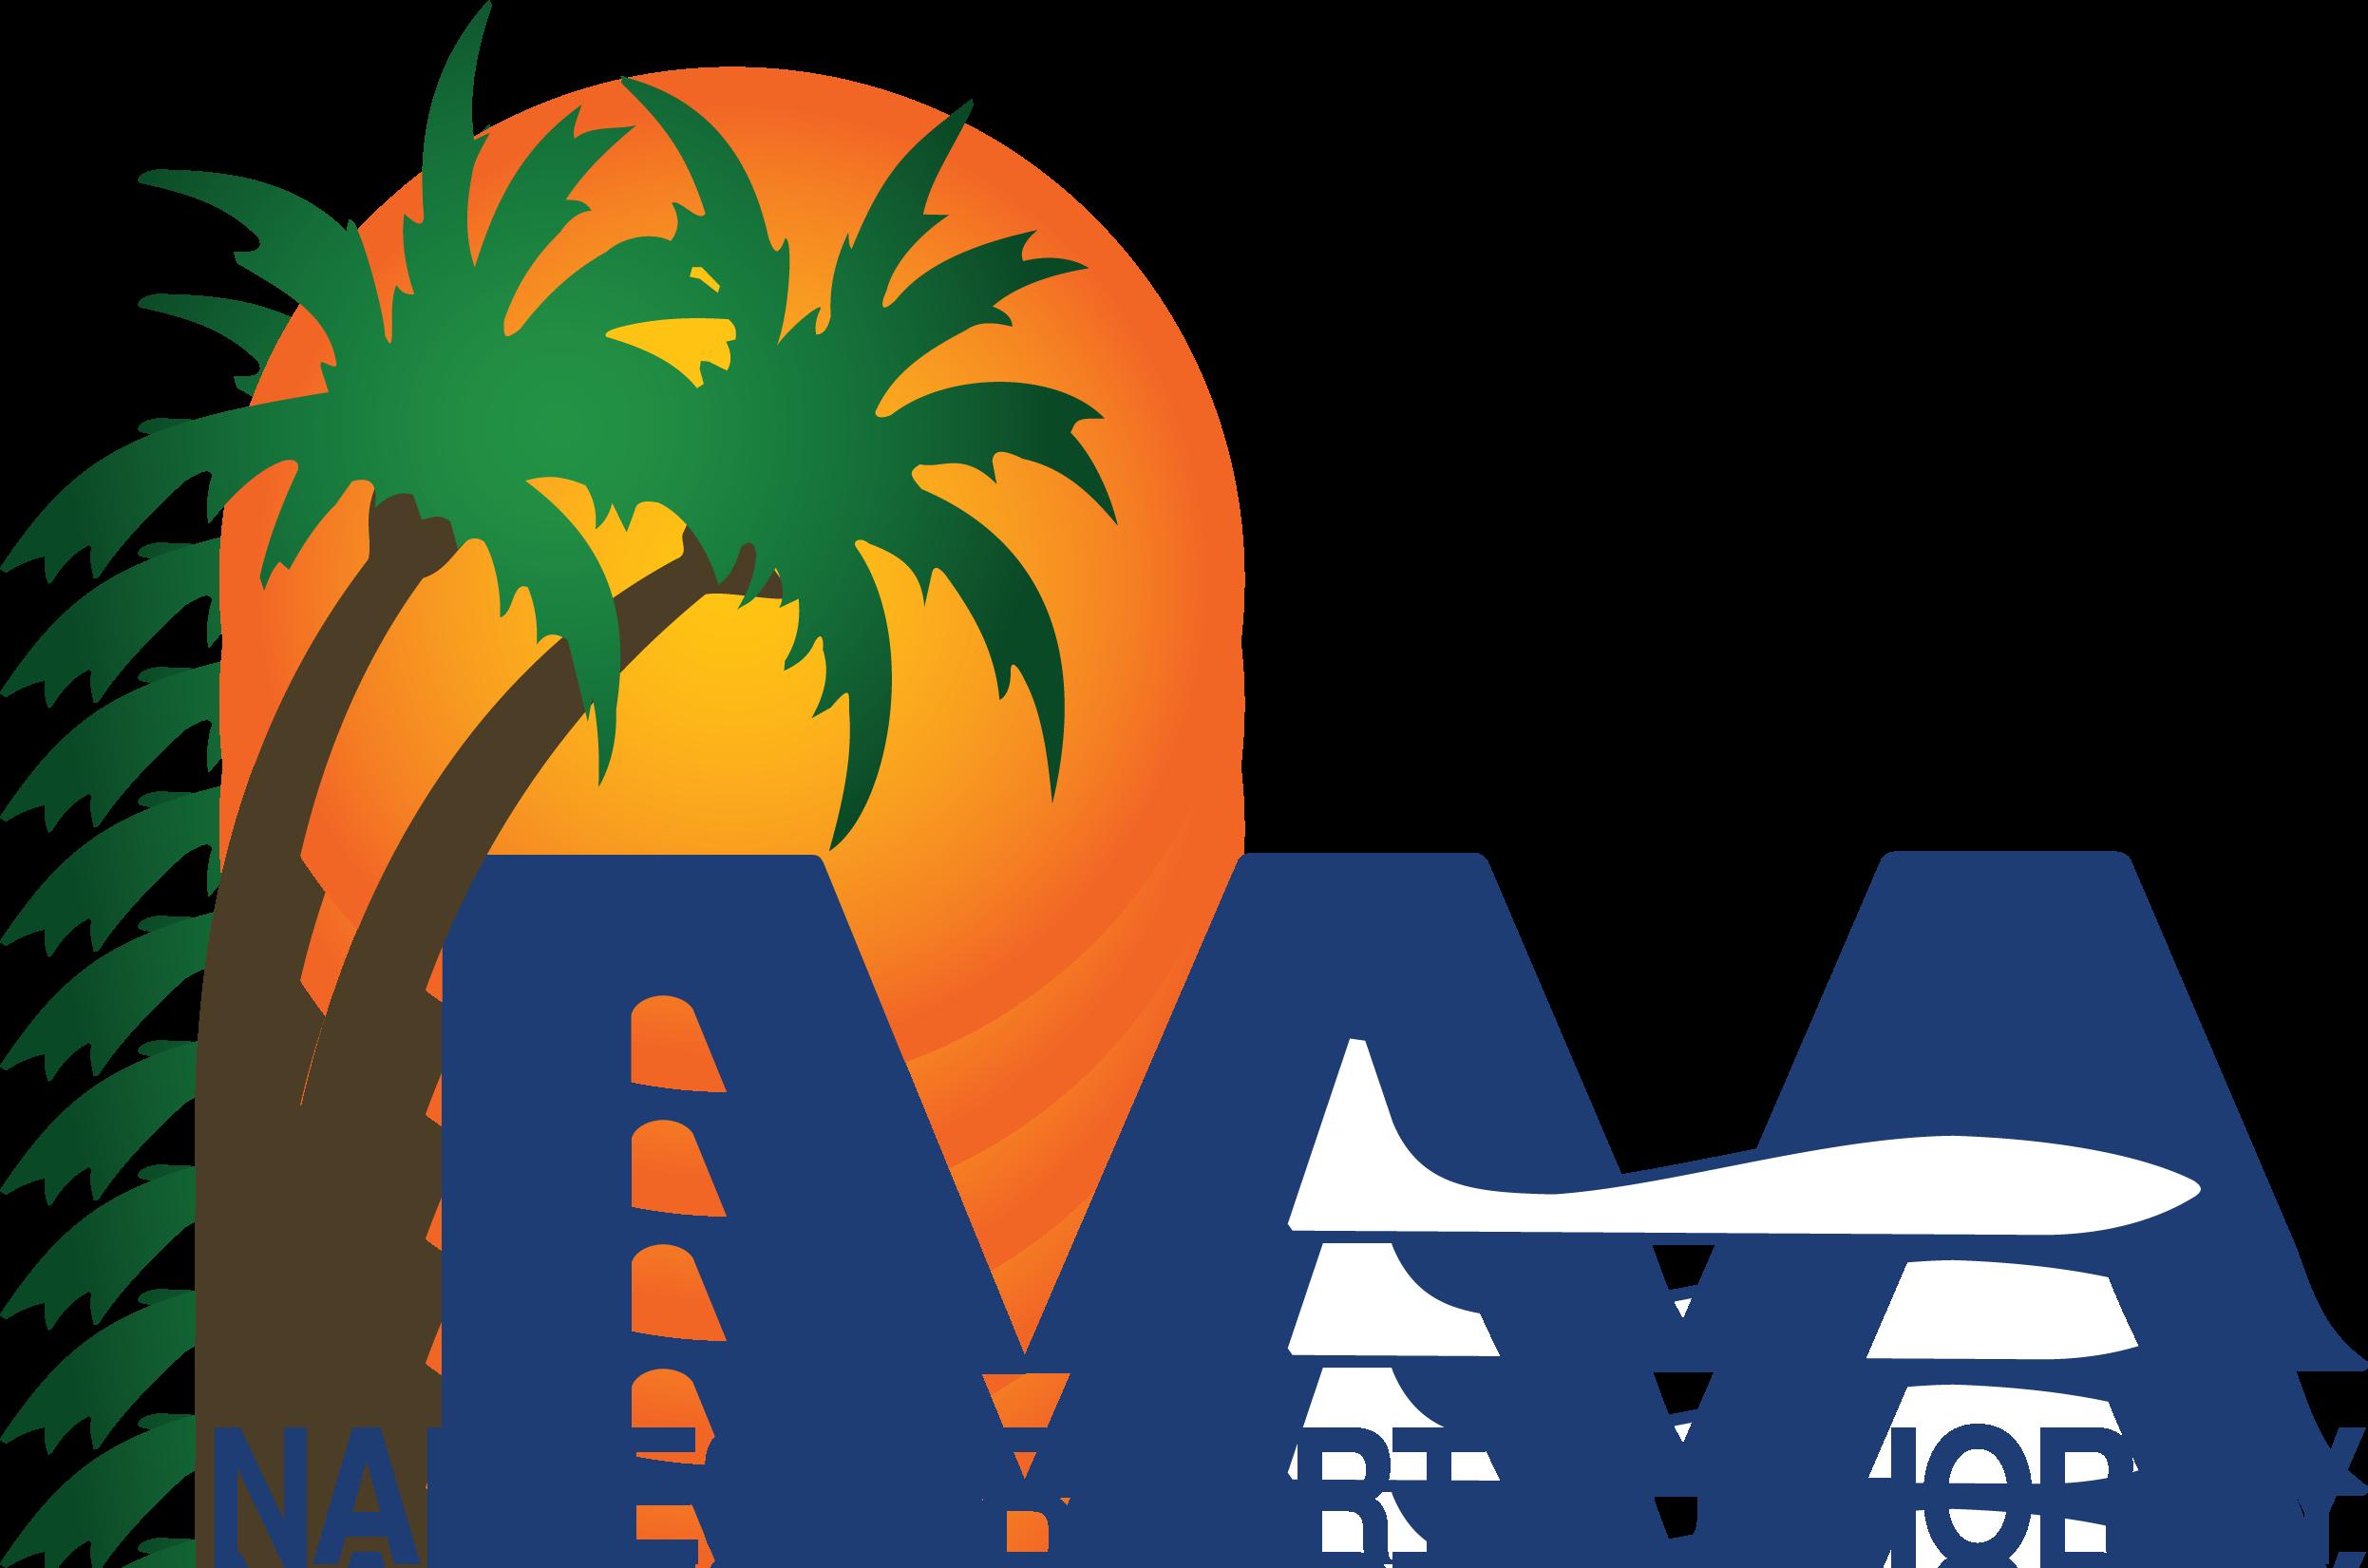 USE NAA logo